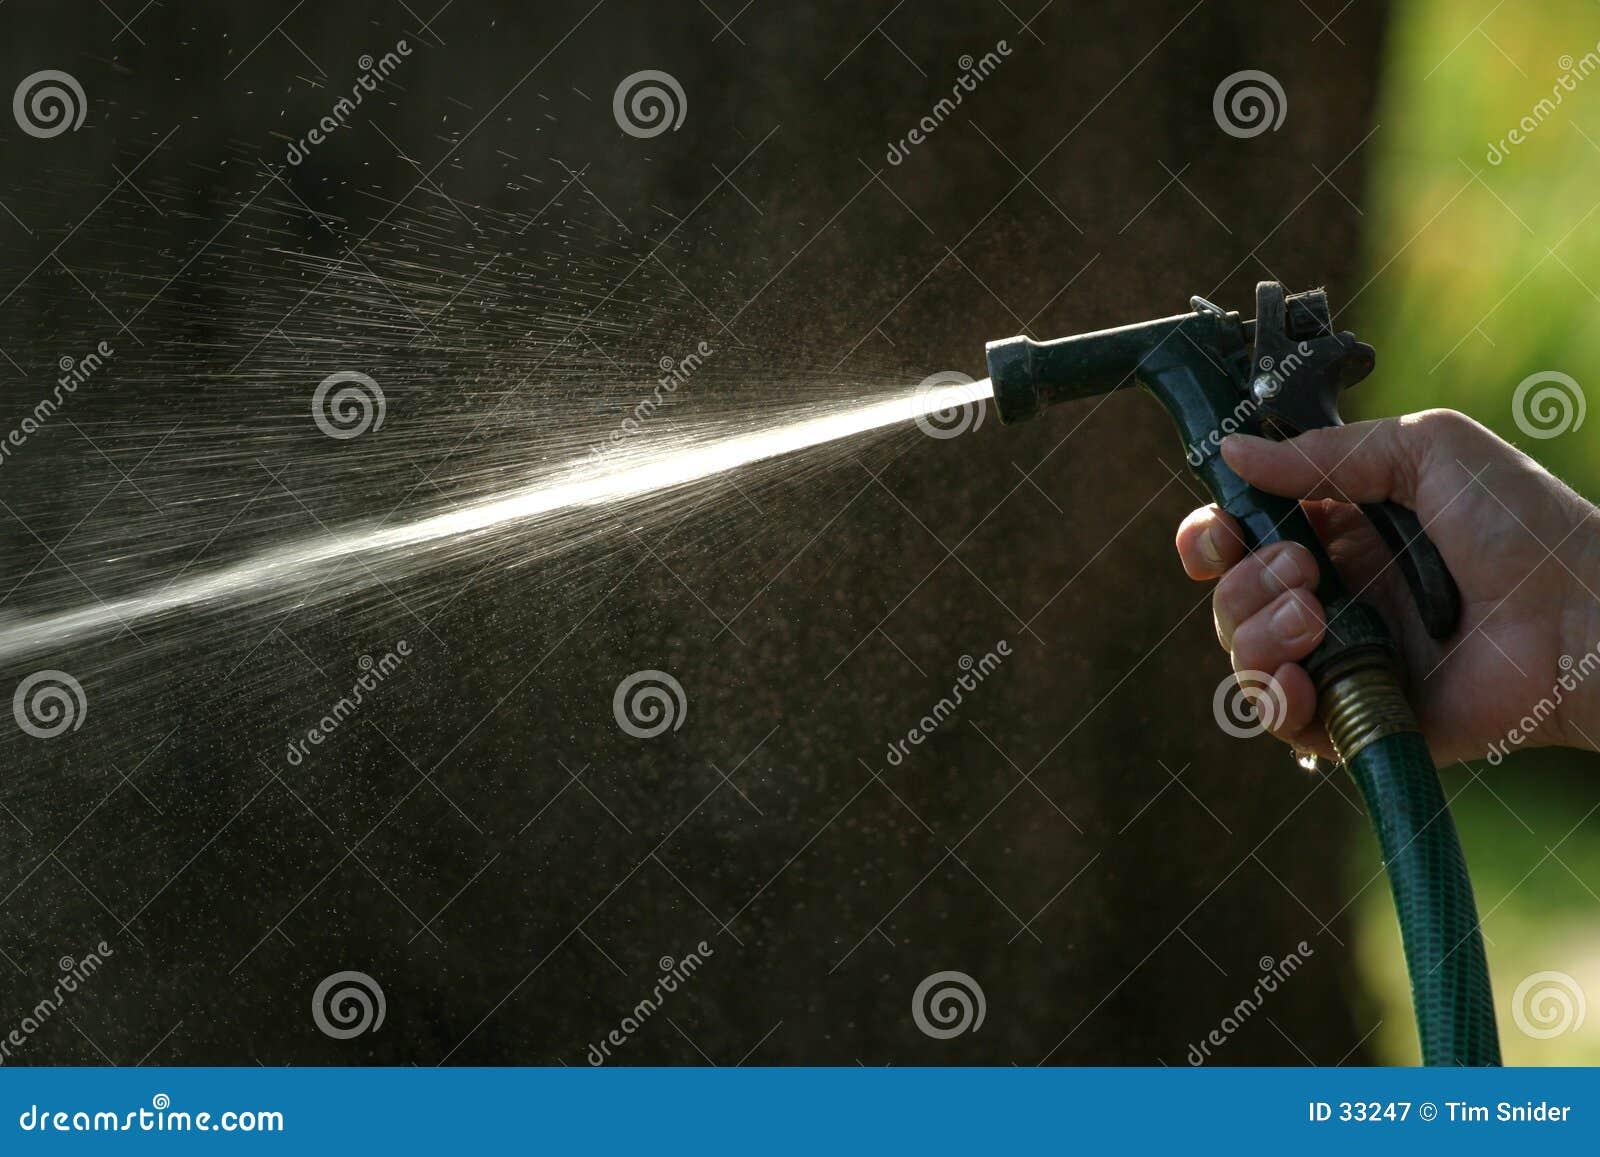 Spraying Hose